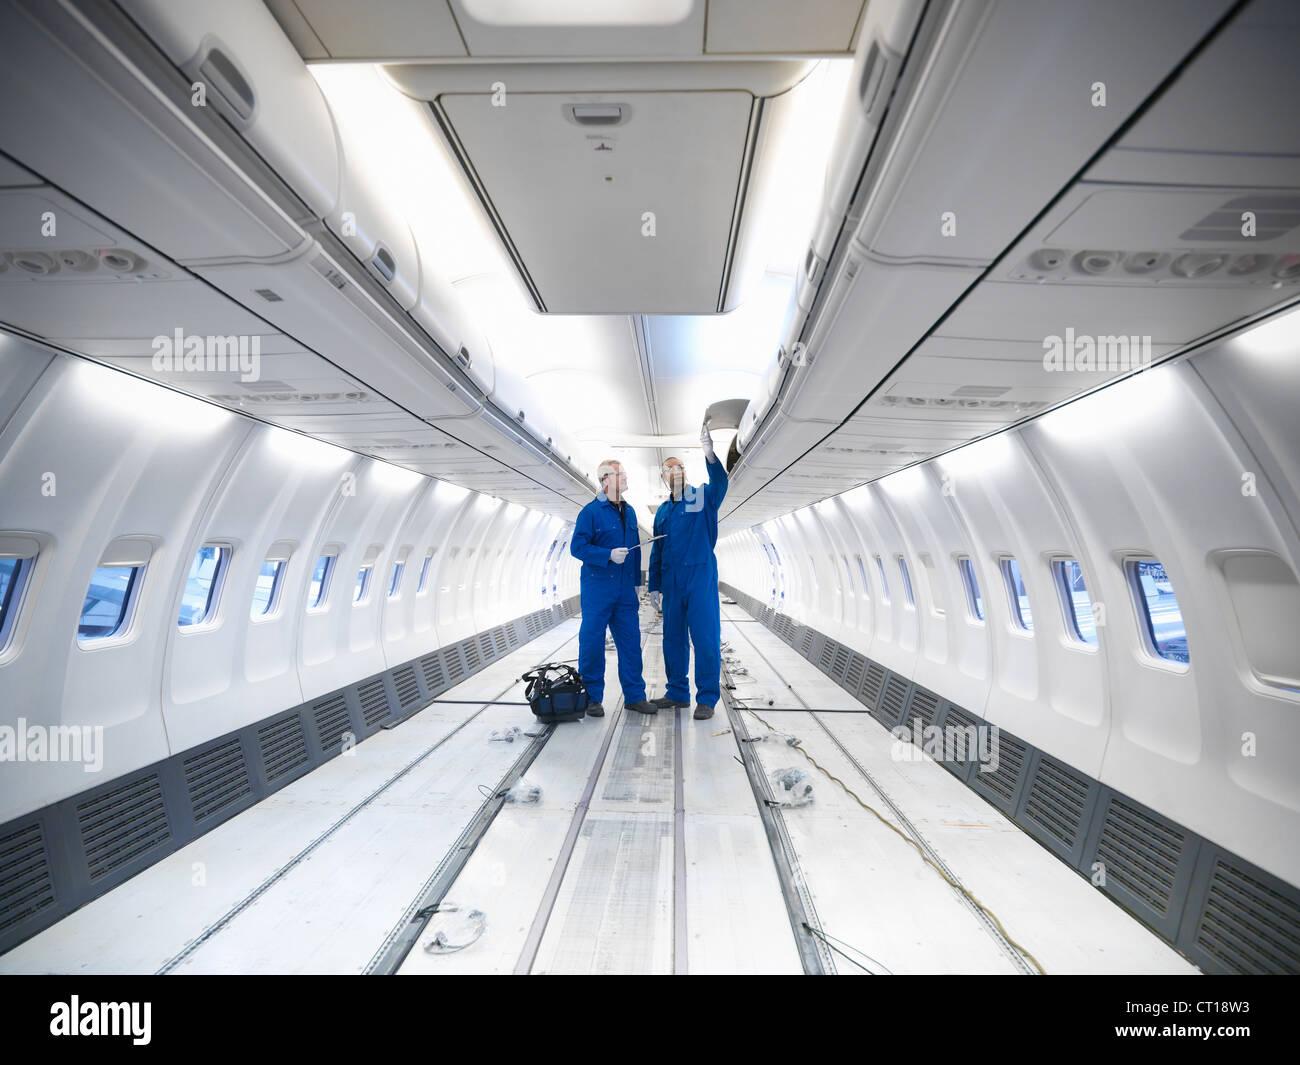 Worker examining empty airplane - Stock Image